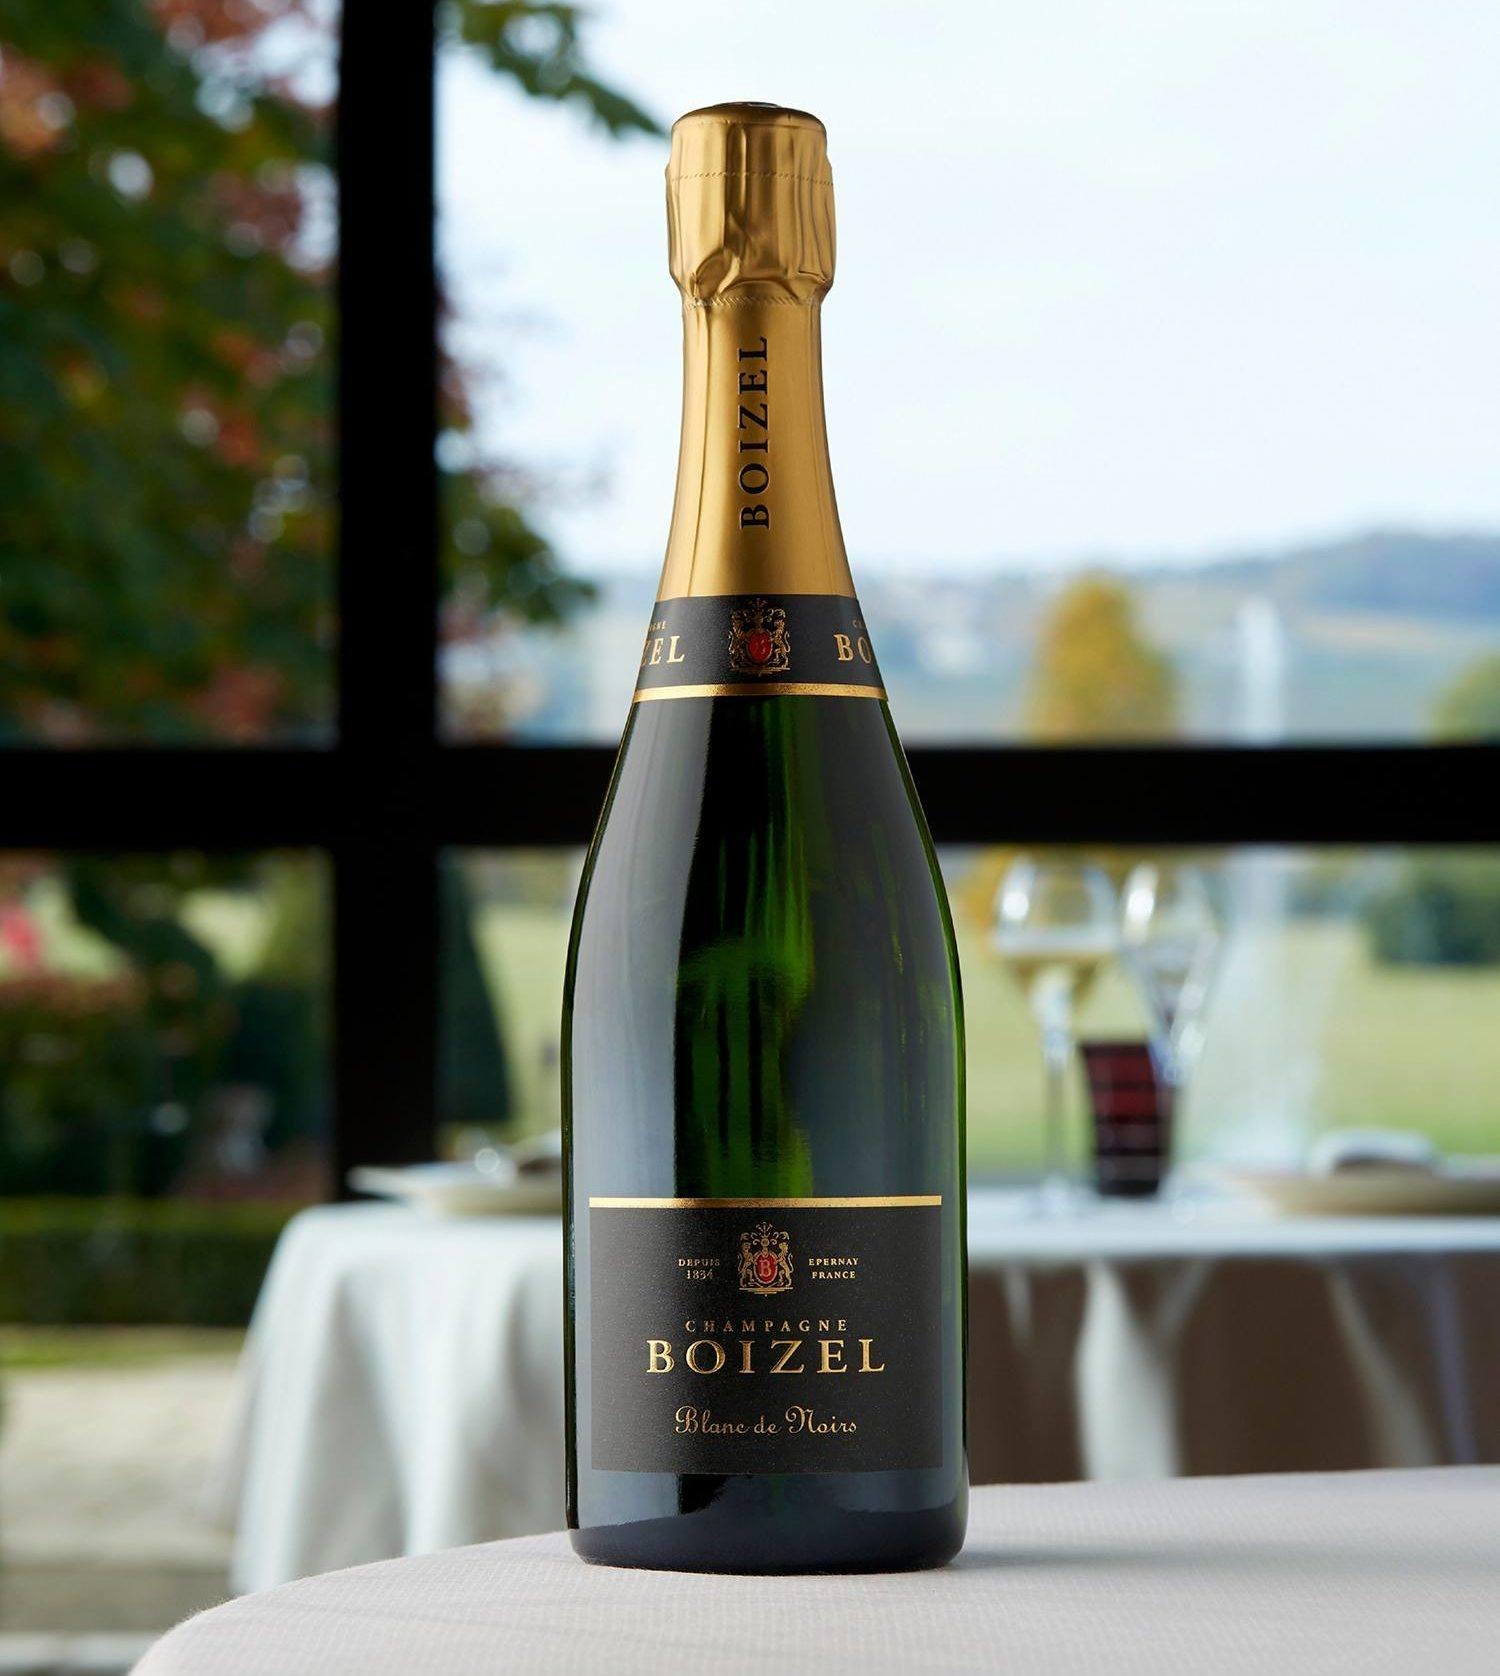 Blanc de Noirs - Champagne Boizel - Epernay France